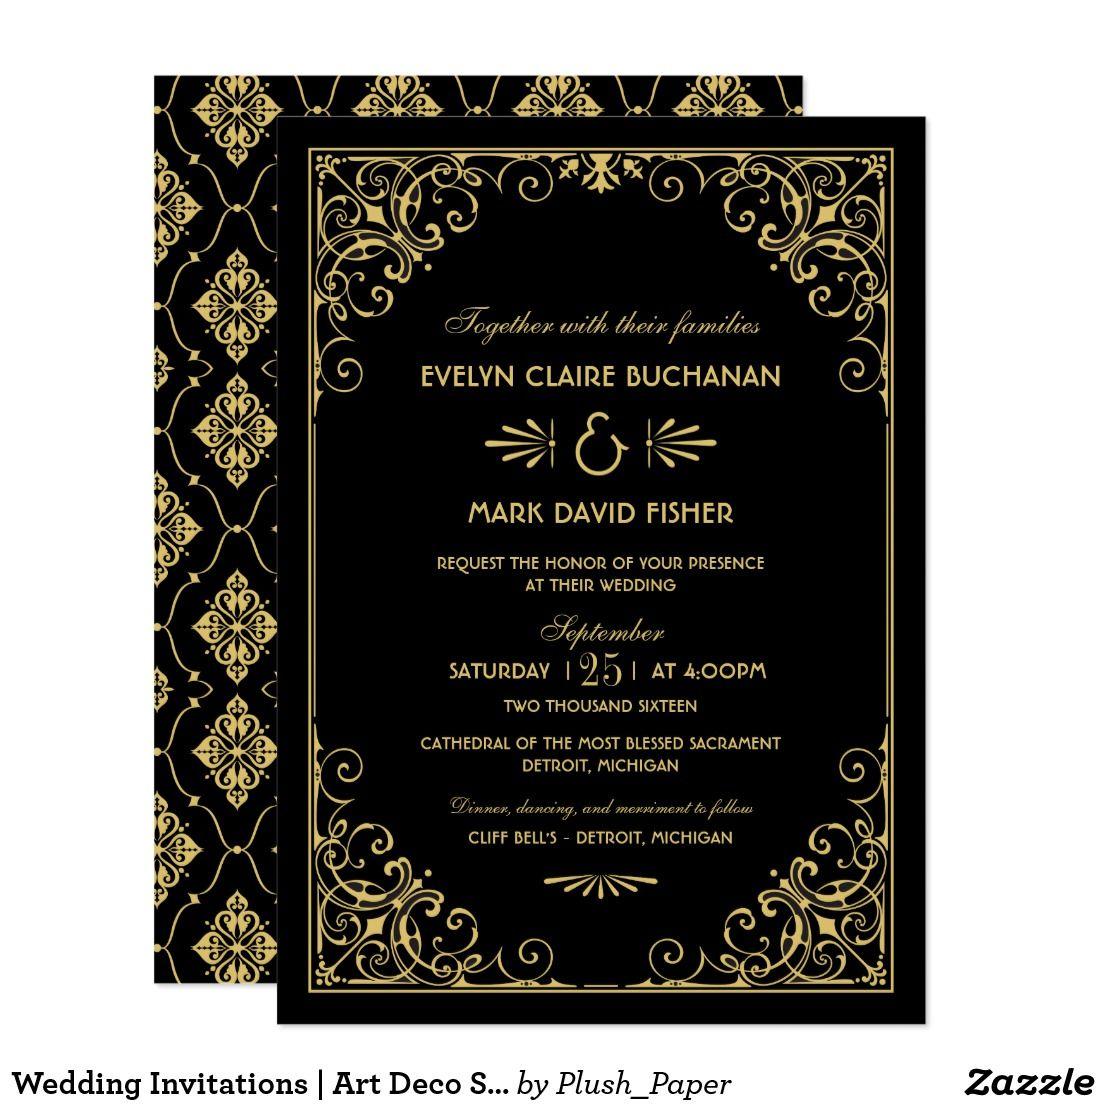 Wedding Invitations Art Deco Style Vintage Wedding Invitations